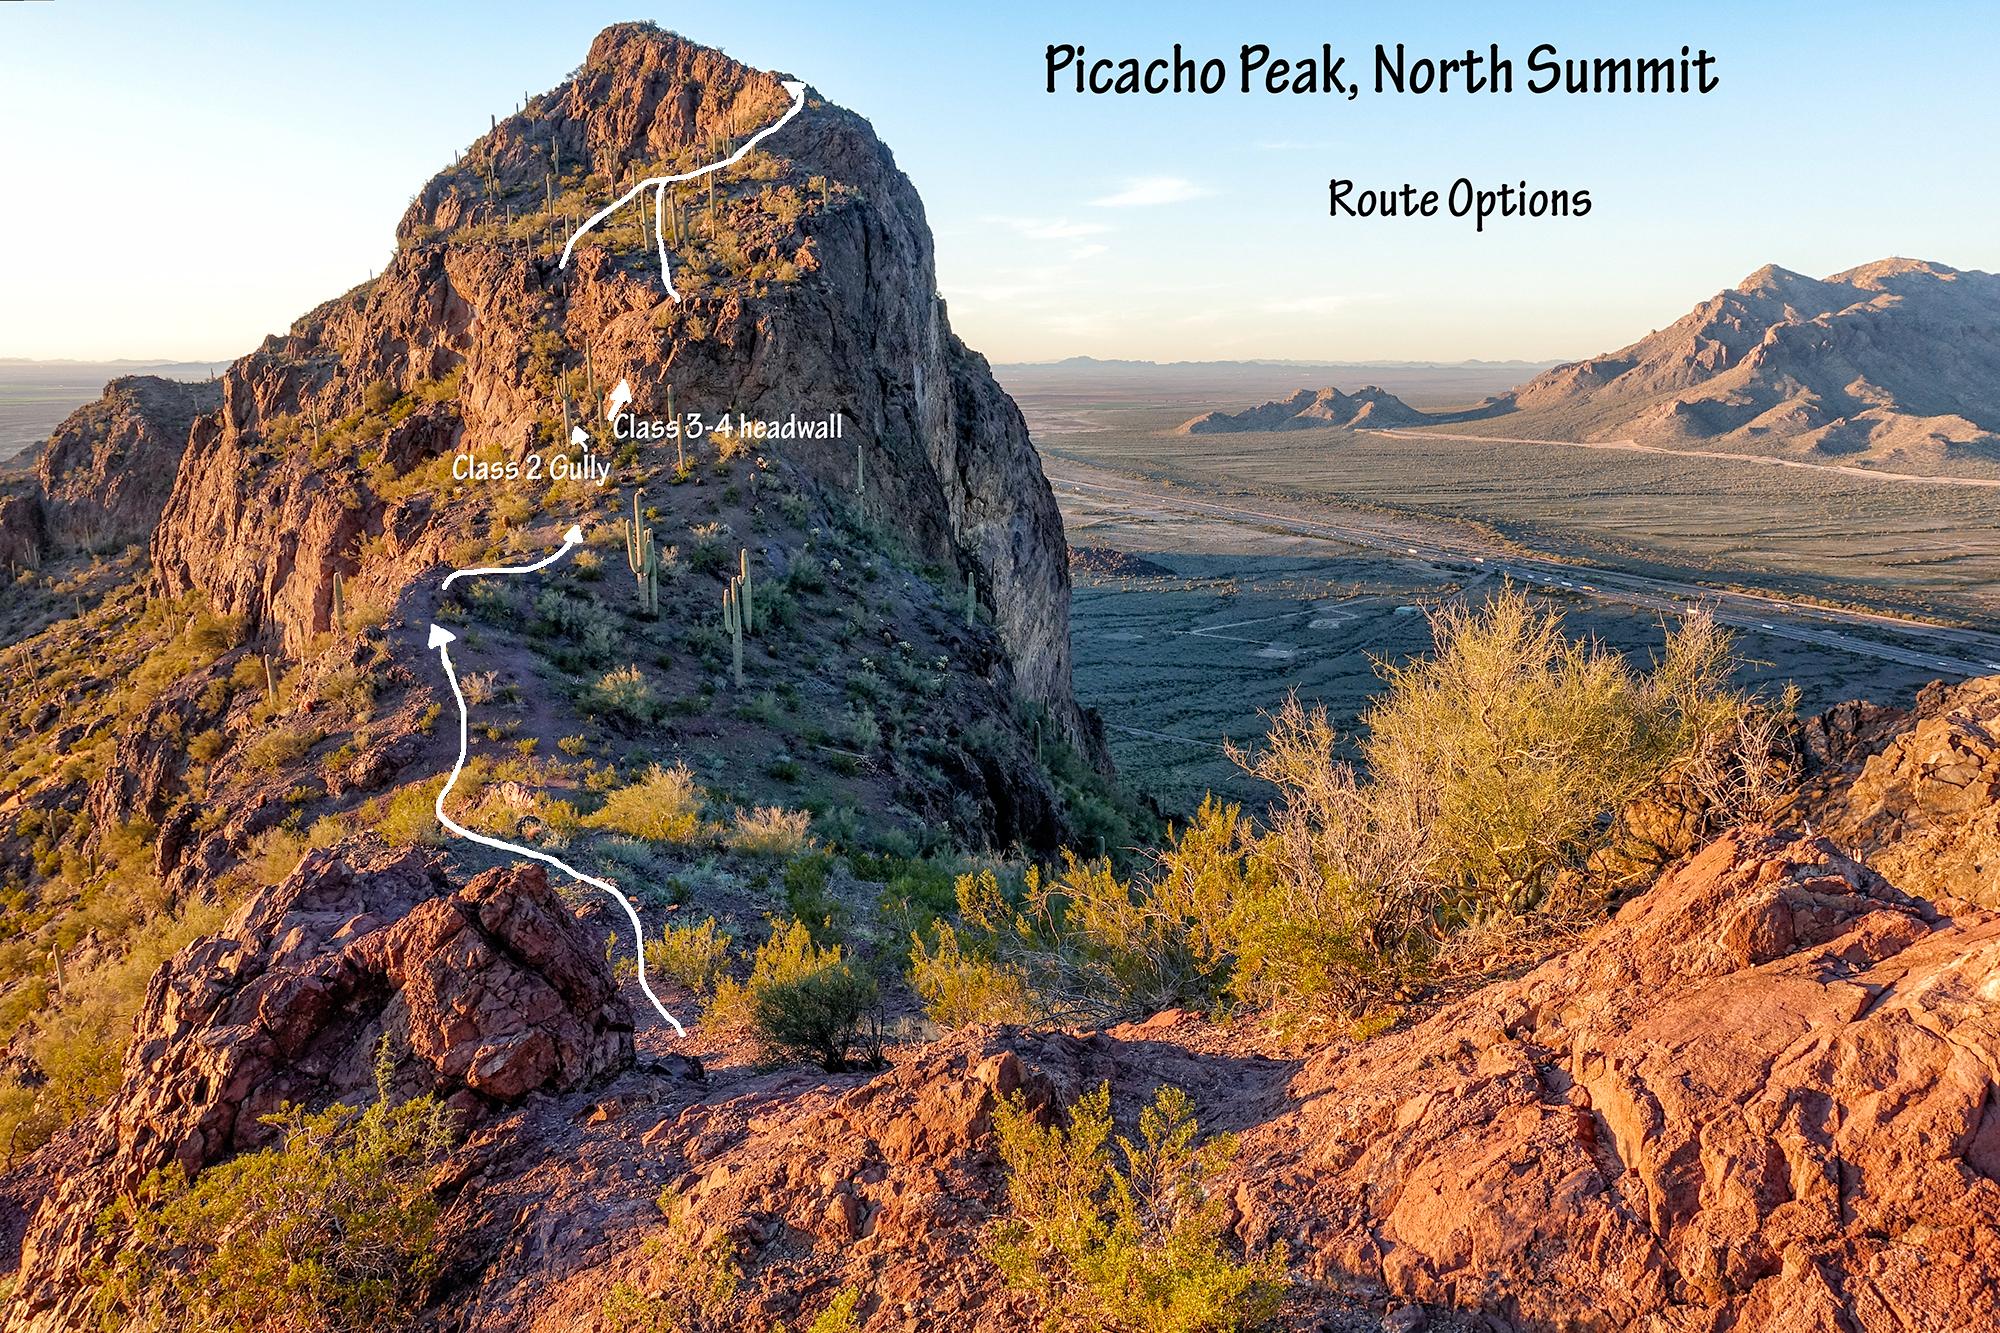 North Summit Route. Picacho Peak, Arizona, 2016